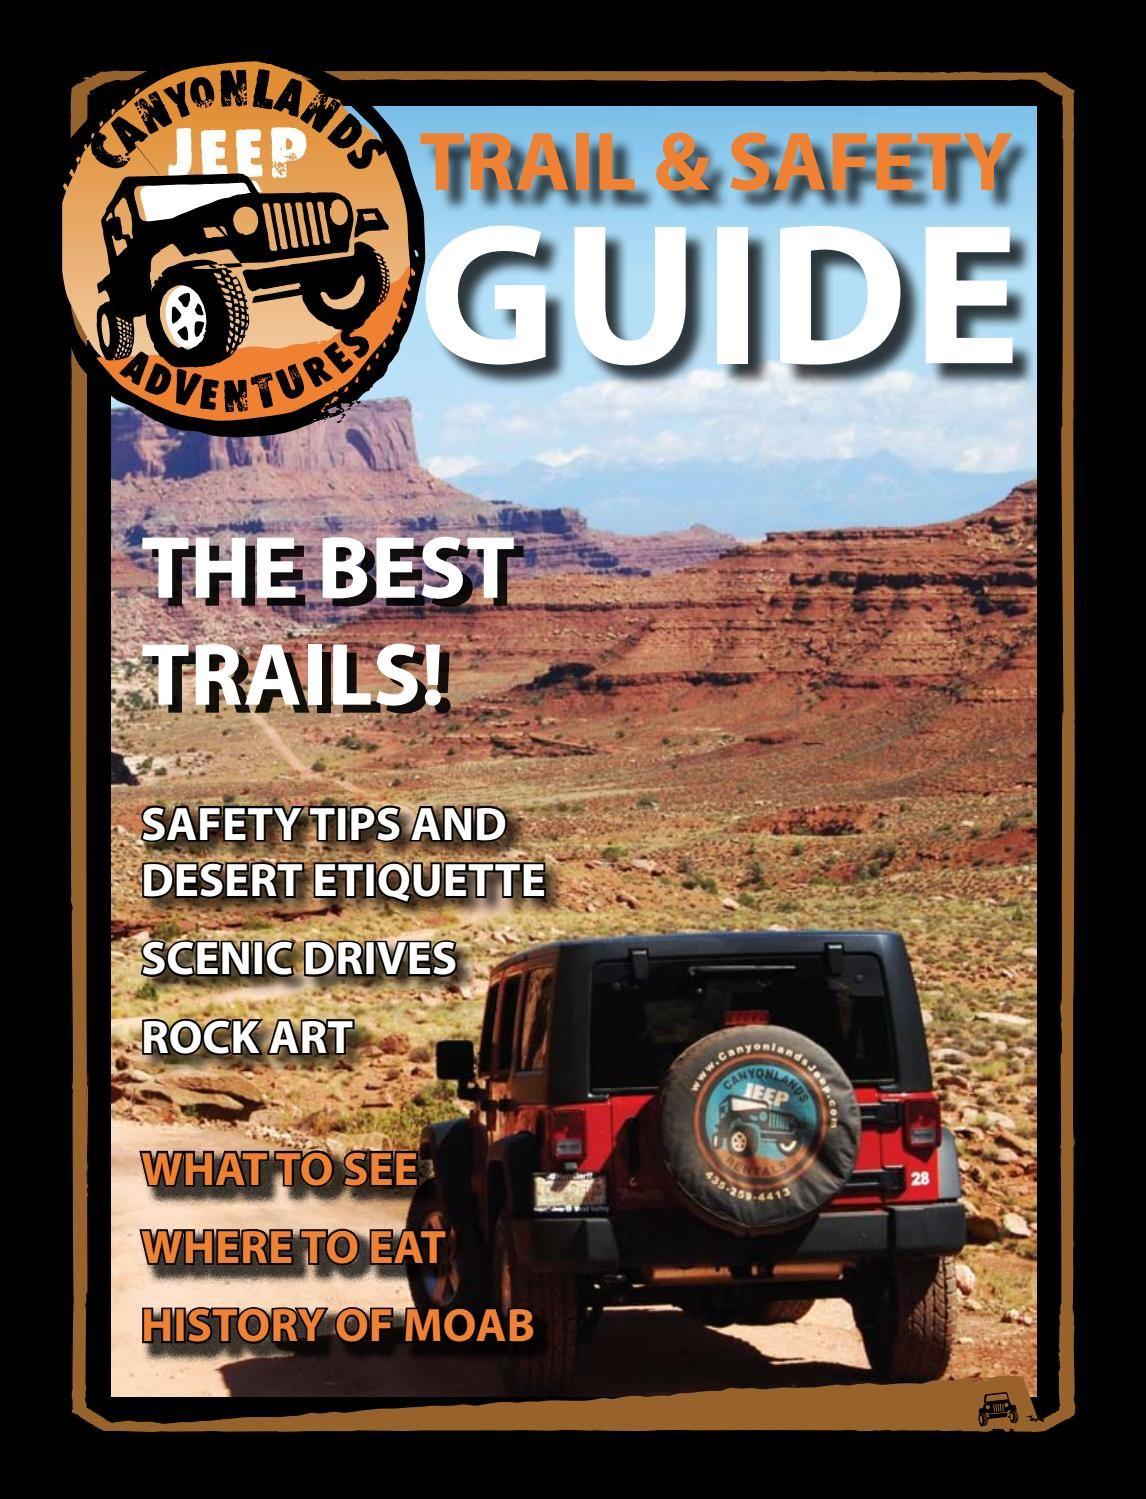 Moab Utah Canyonlands Jeep Trail Guide In 2020 Jeep Trails Moab Utah